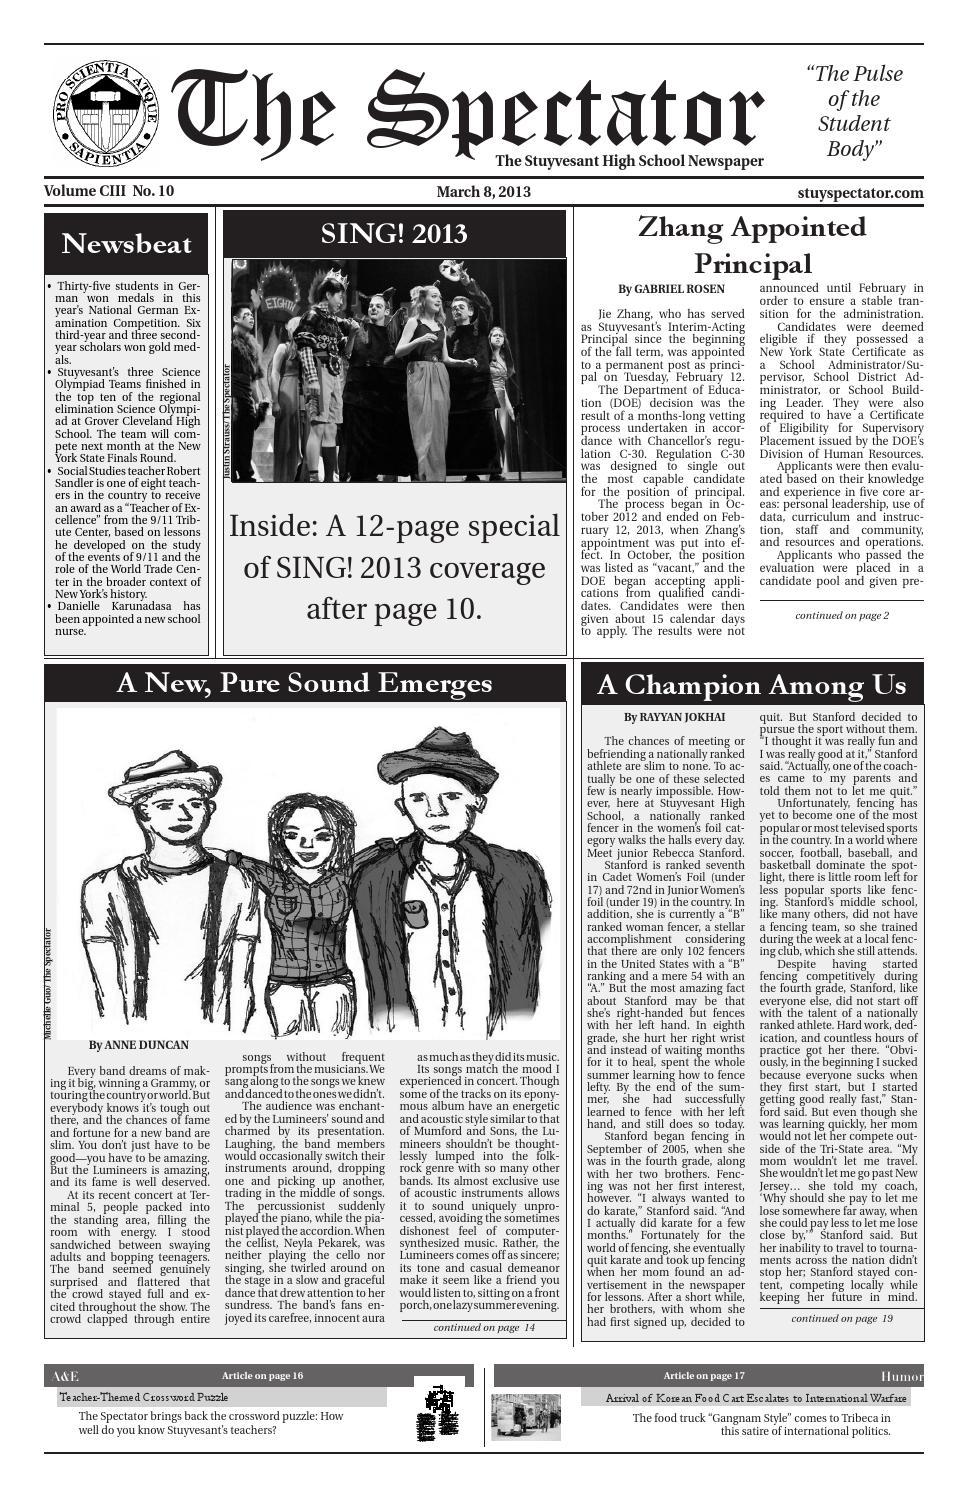 Volume 103, Issue 10 by The Stuyvesant Spectator issuu